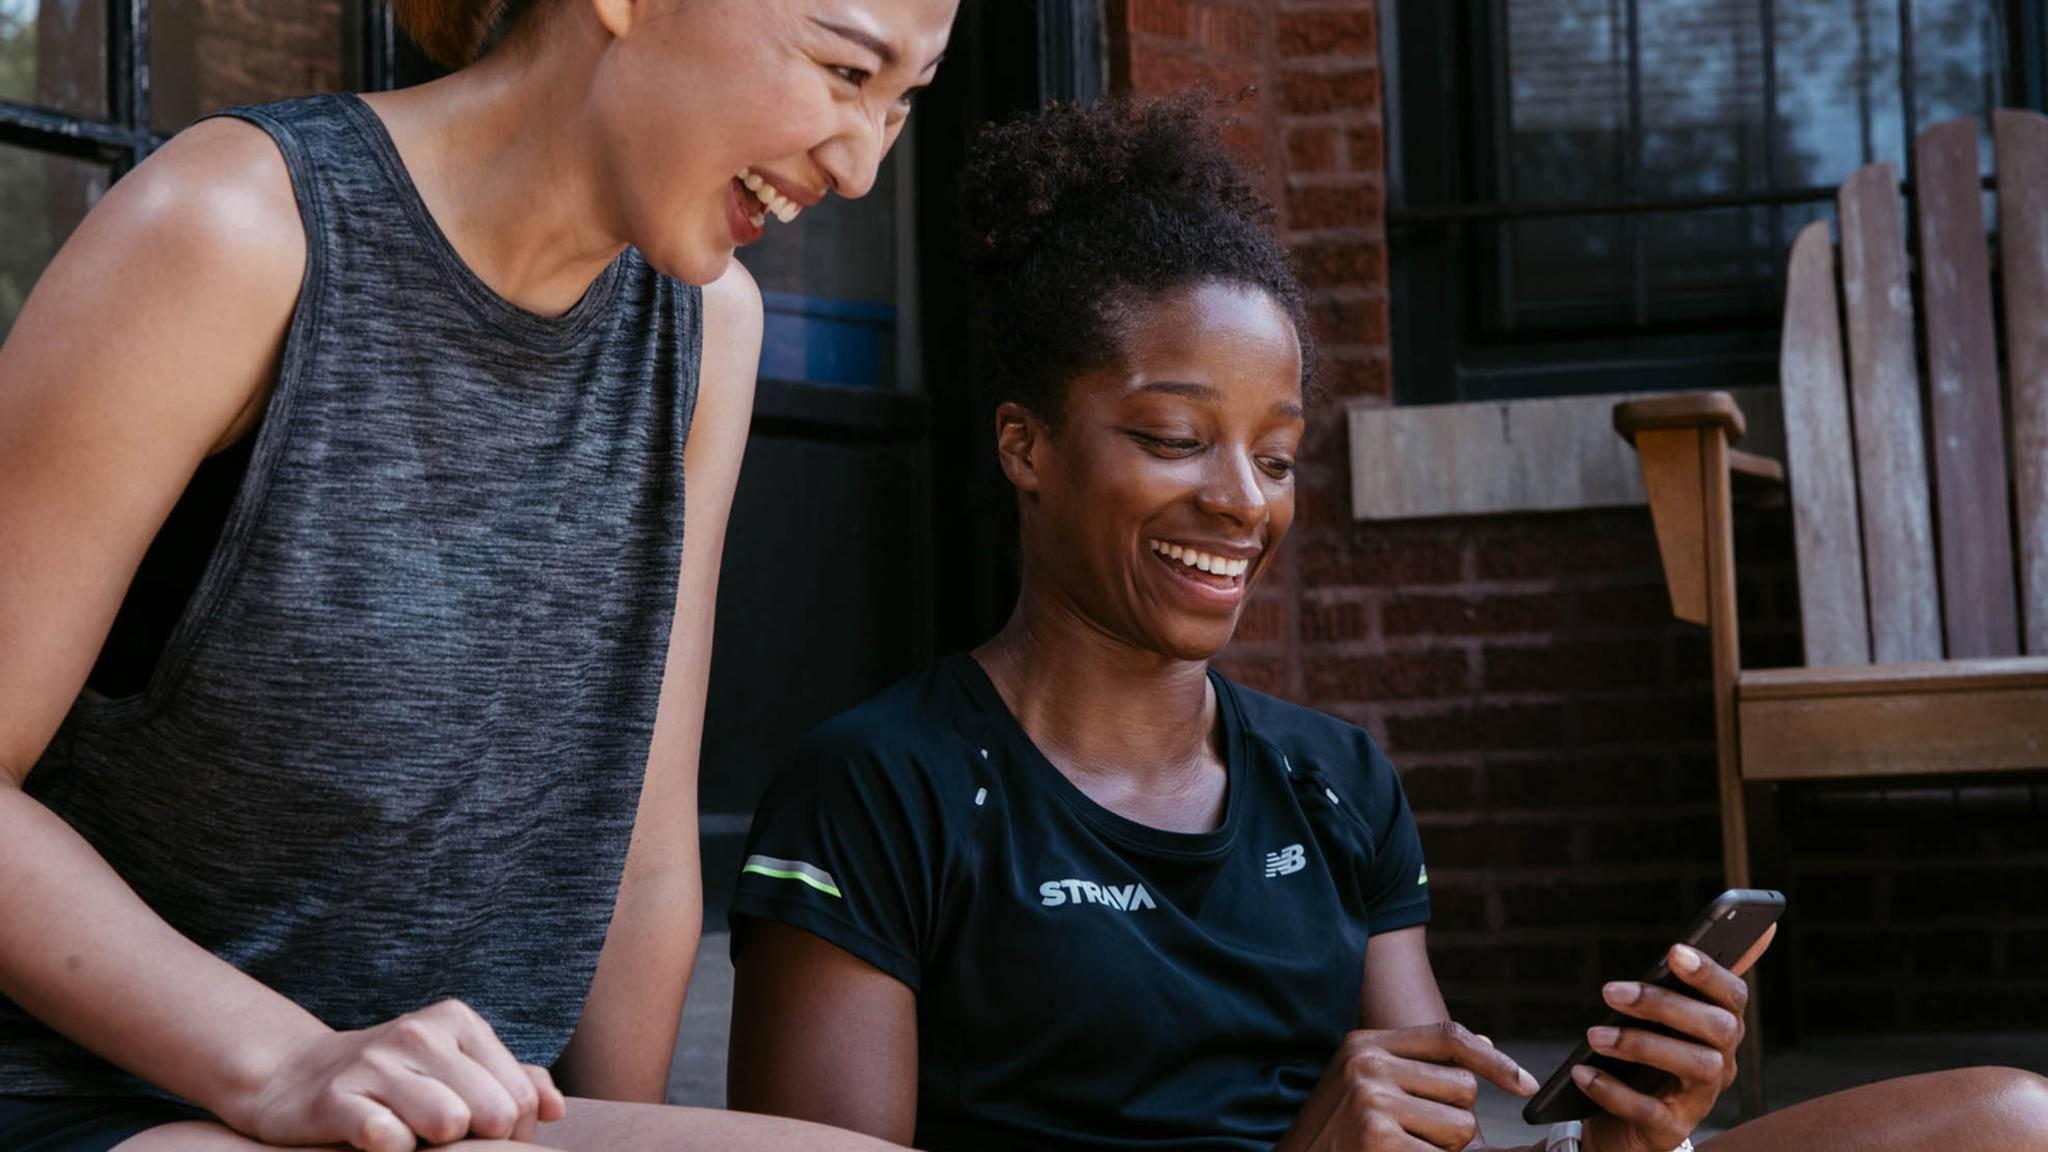 strava app frauen smartphone fitness